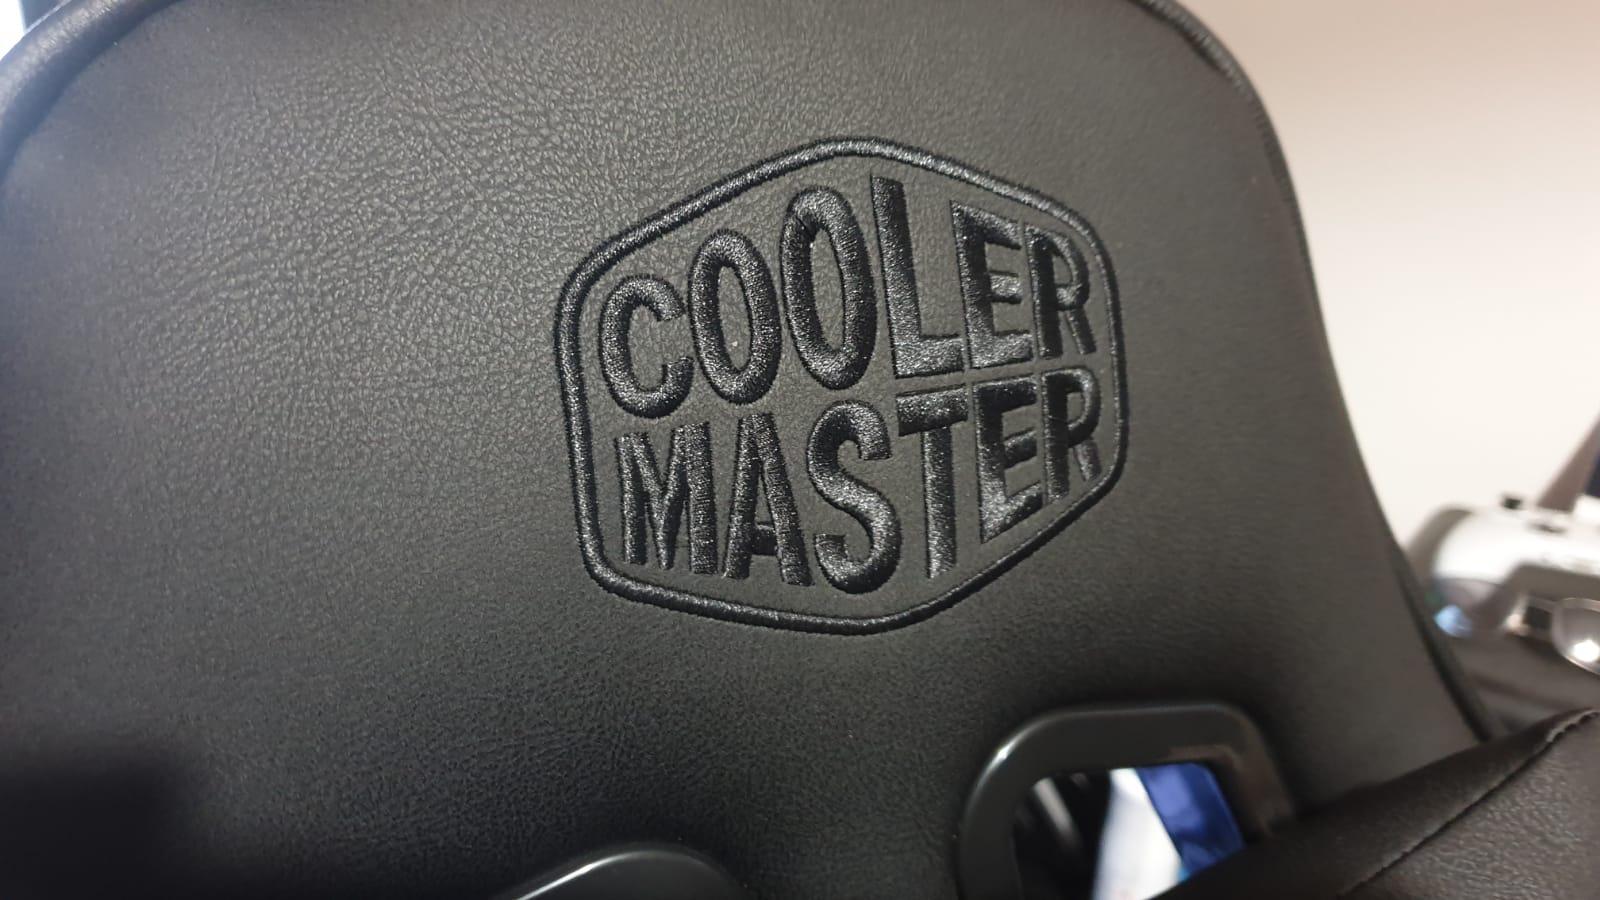 Speciale Cooler Master Caliber R1